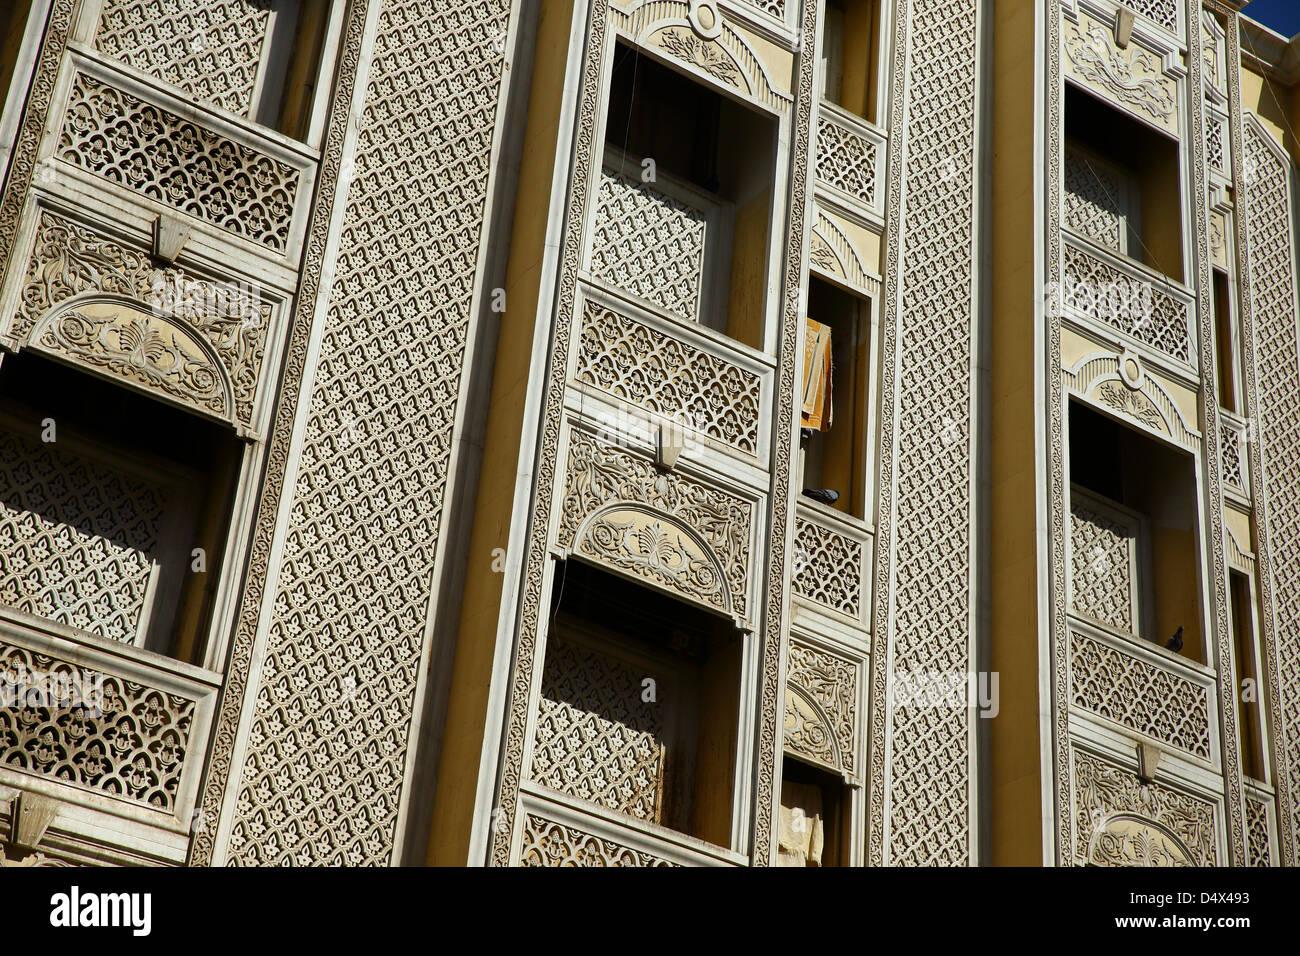 Architectural detail, Dubai, United Arab Emirates - Stock Image